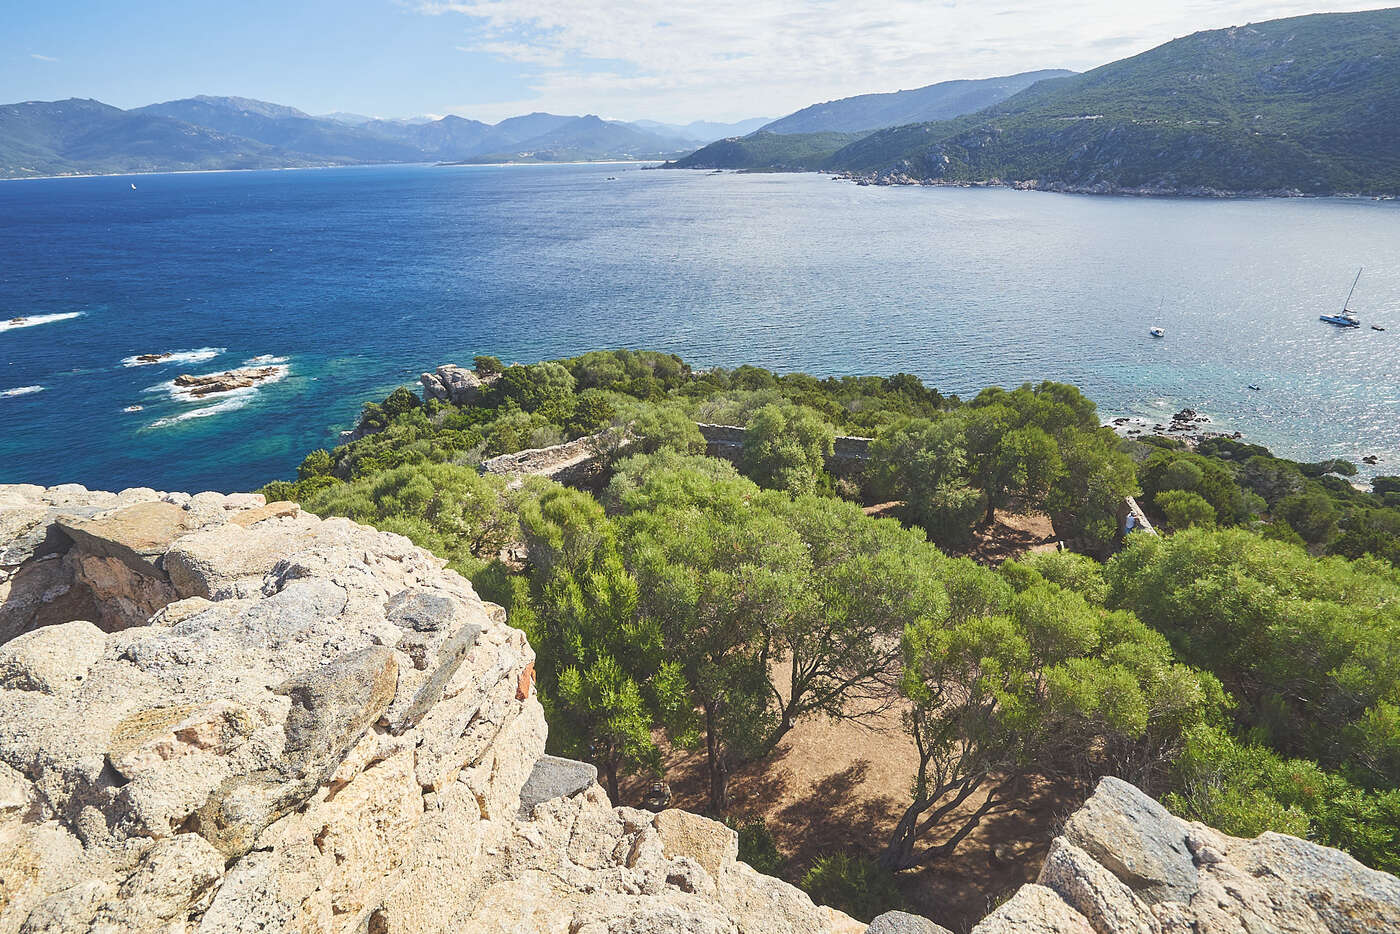 Vue depuis la tour de Campomoro, Corse